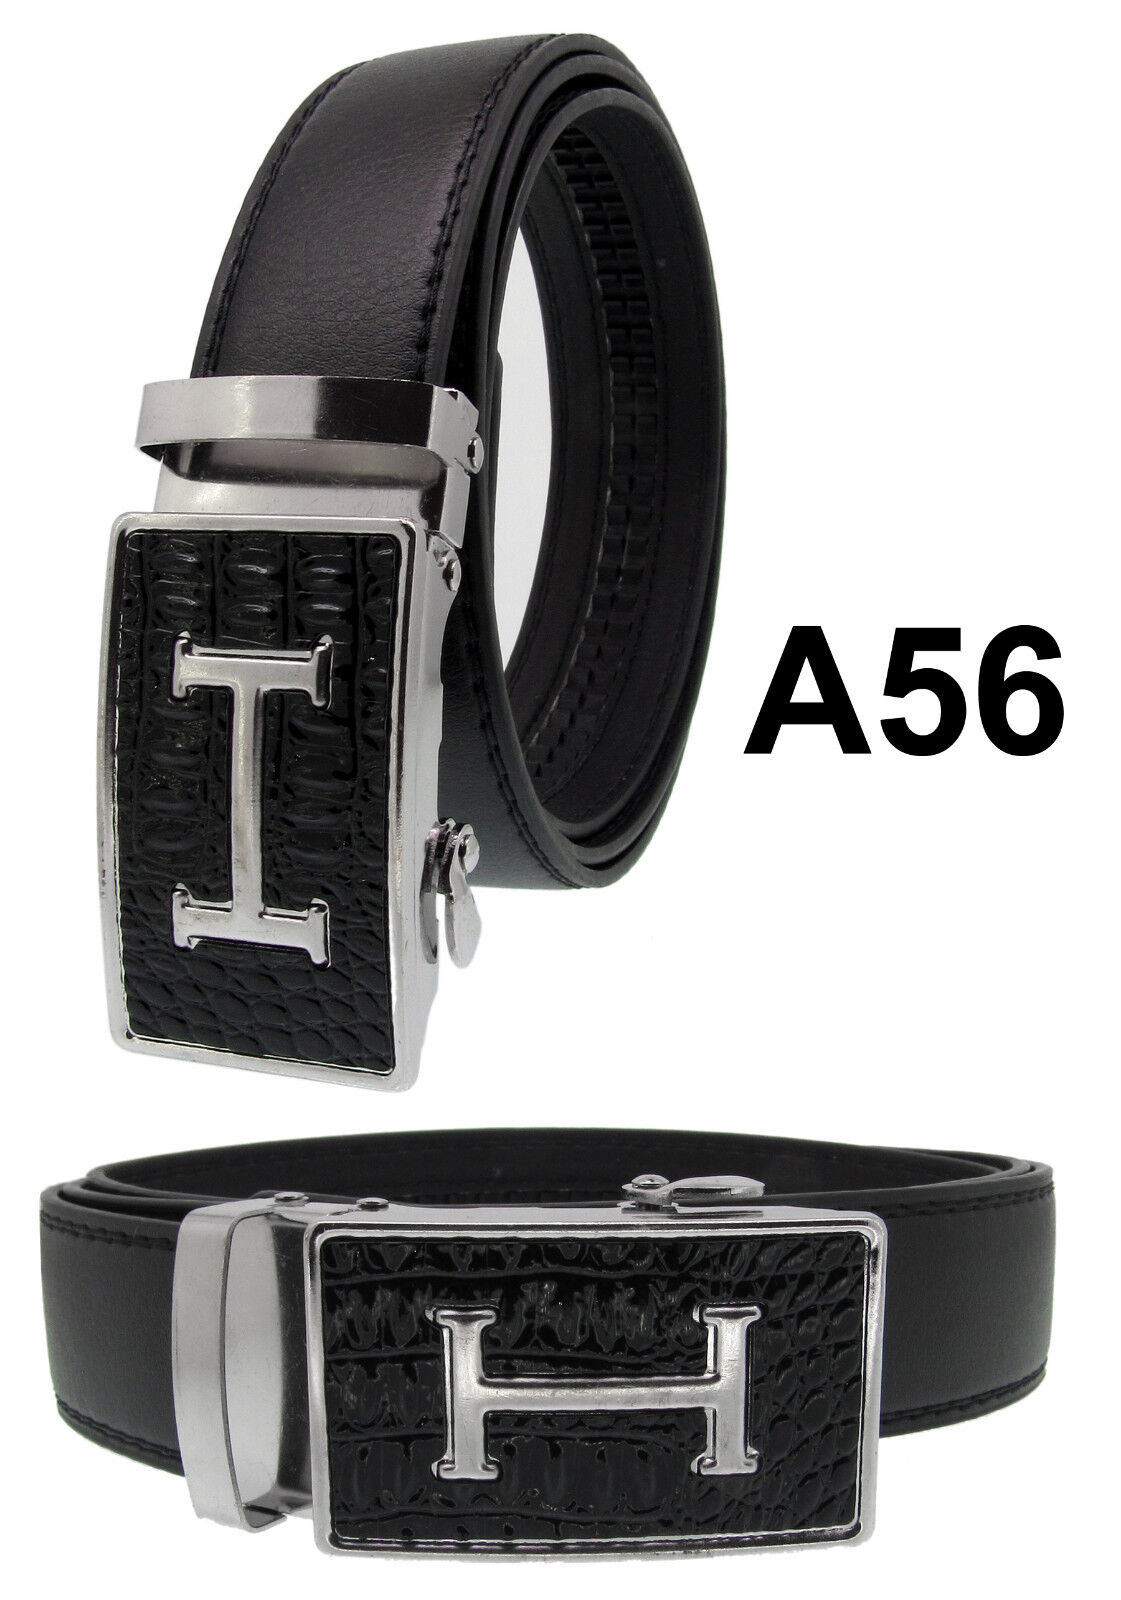 Men Automatic Ratchet Click Lock Black Belt G Buckle Genuine Leather Style A56 Belts